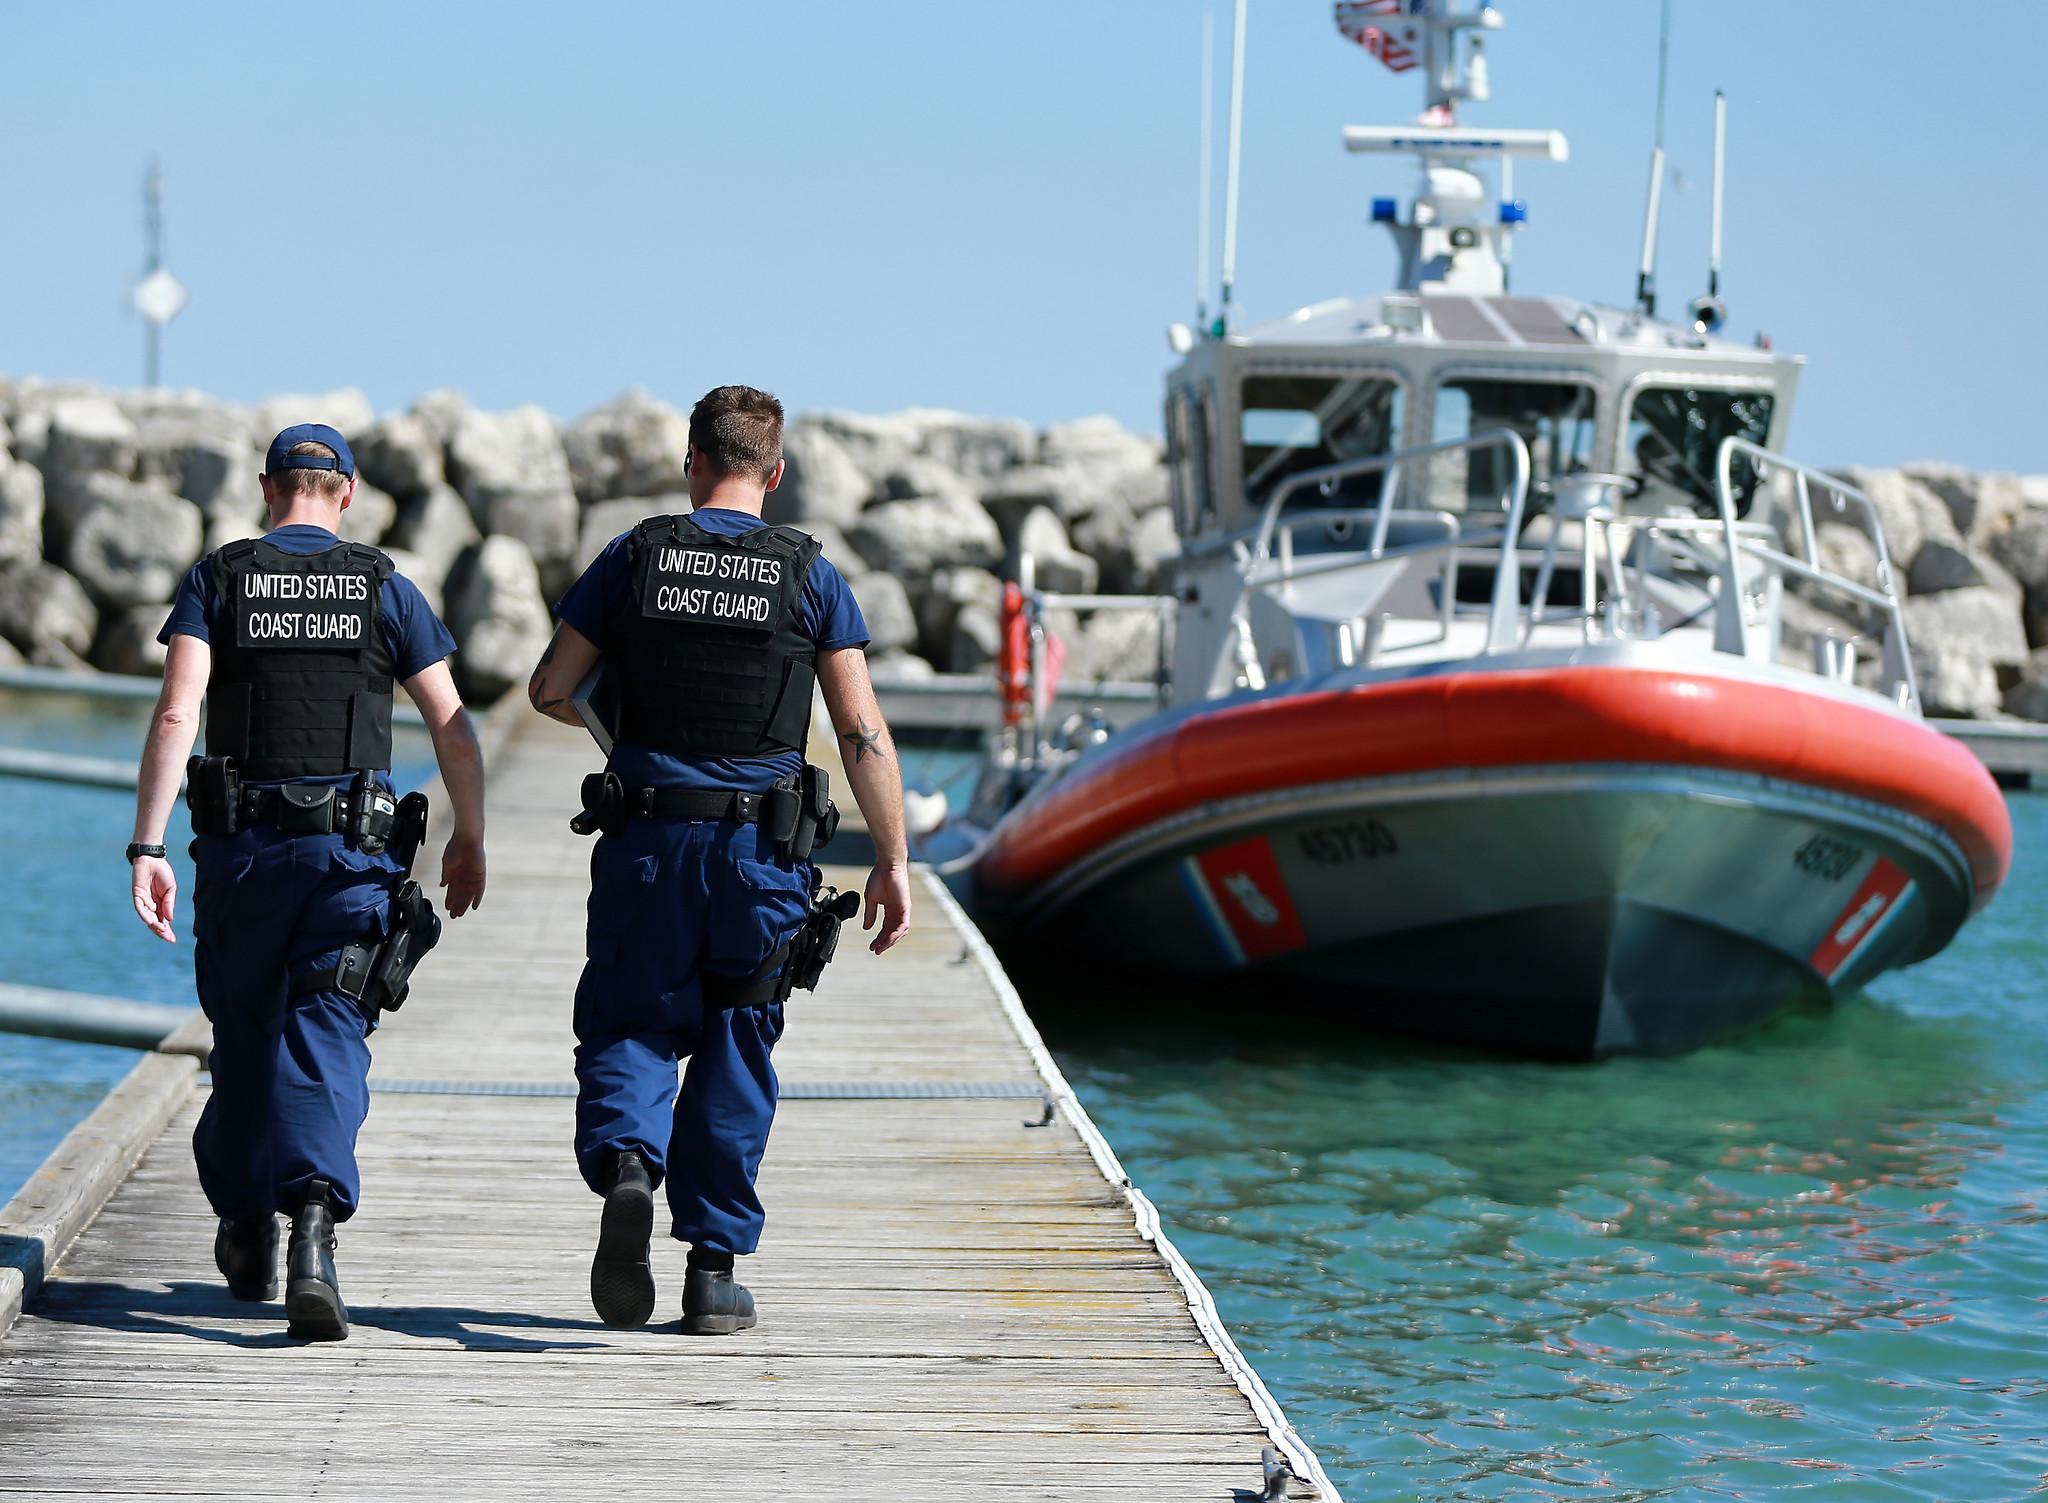 real fake distress calls on lake michigan spike coast guard